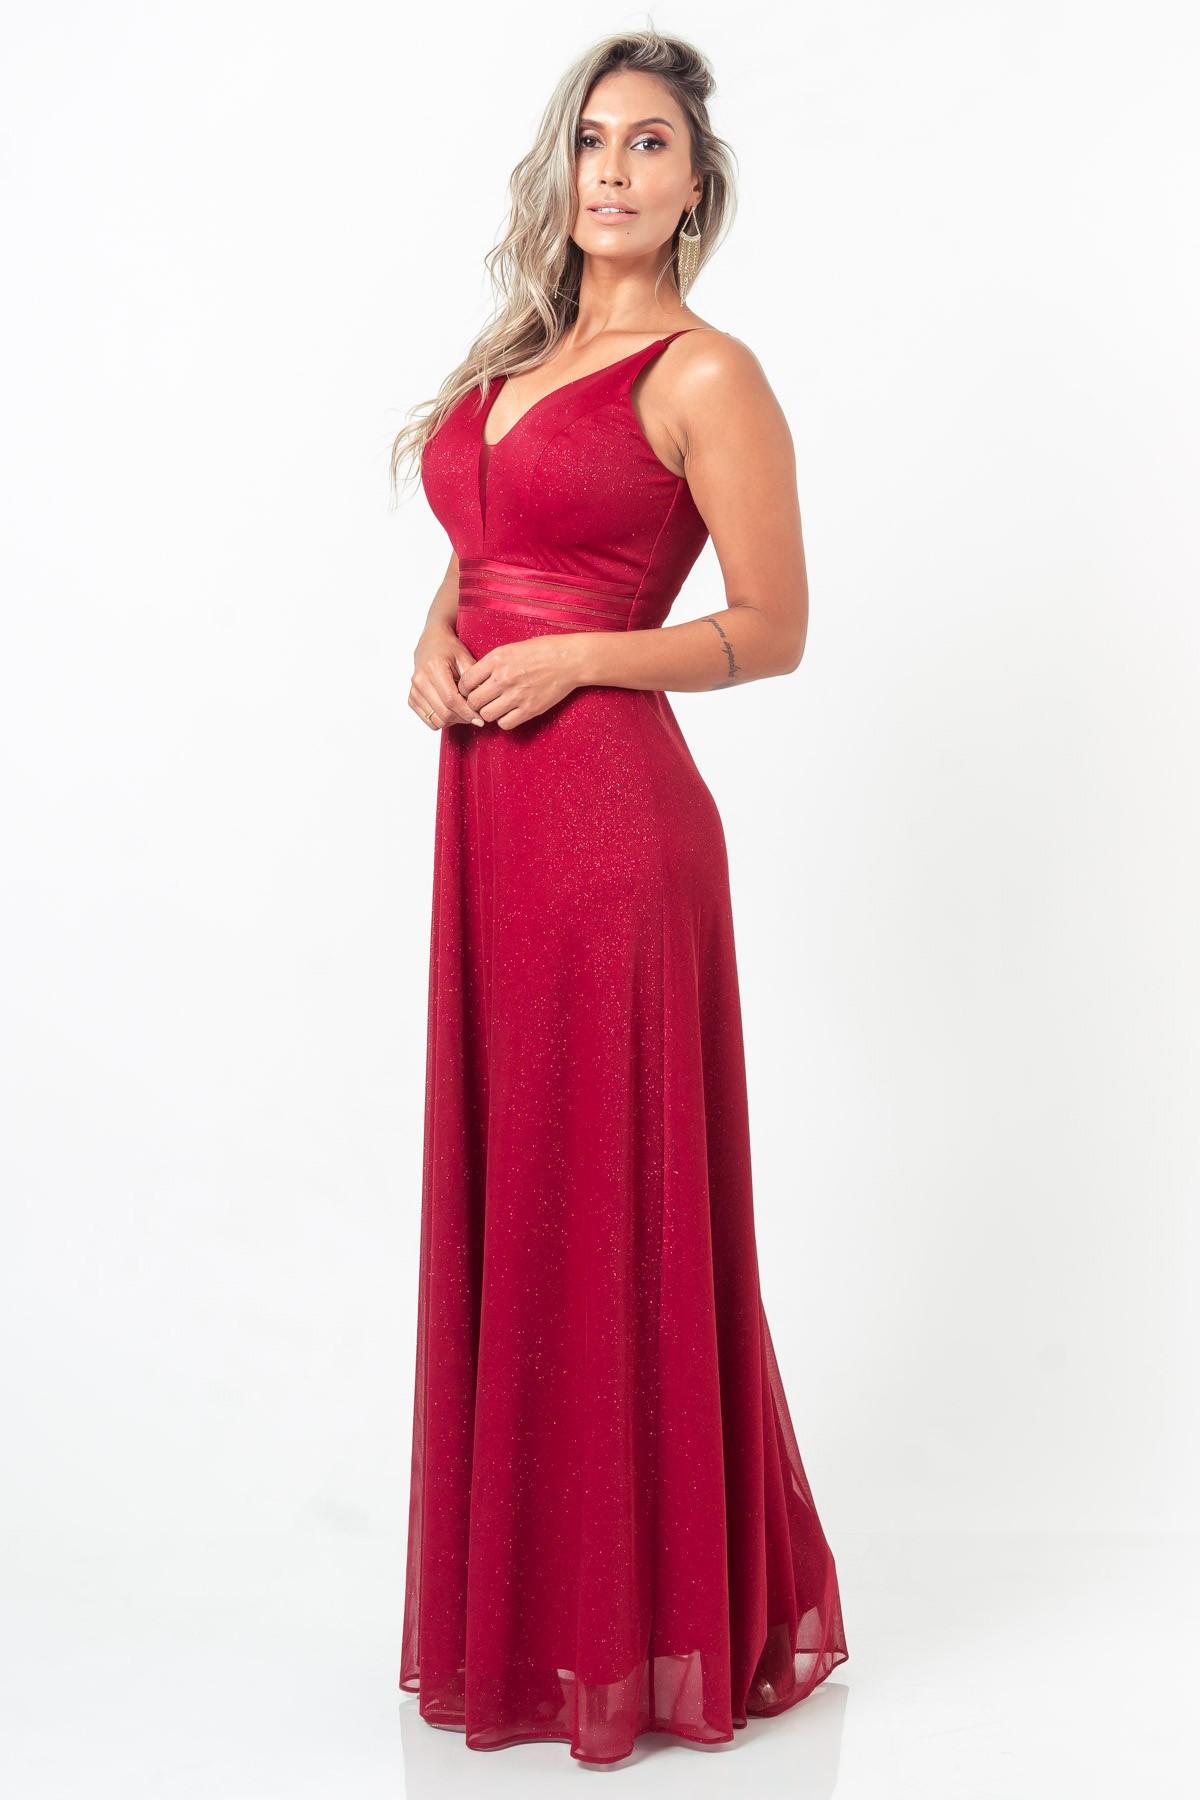 Vestido Mariah - VINHO